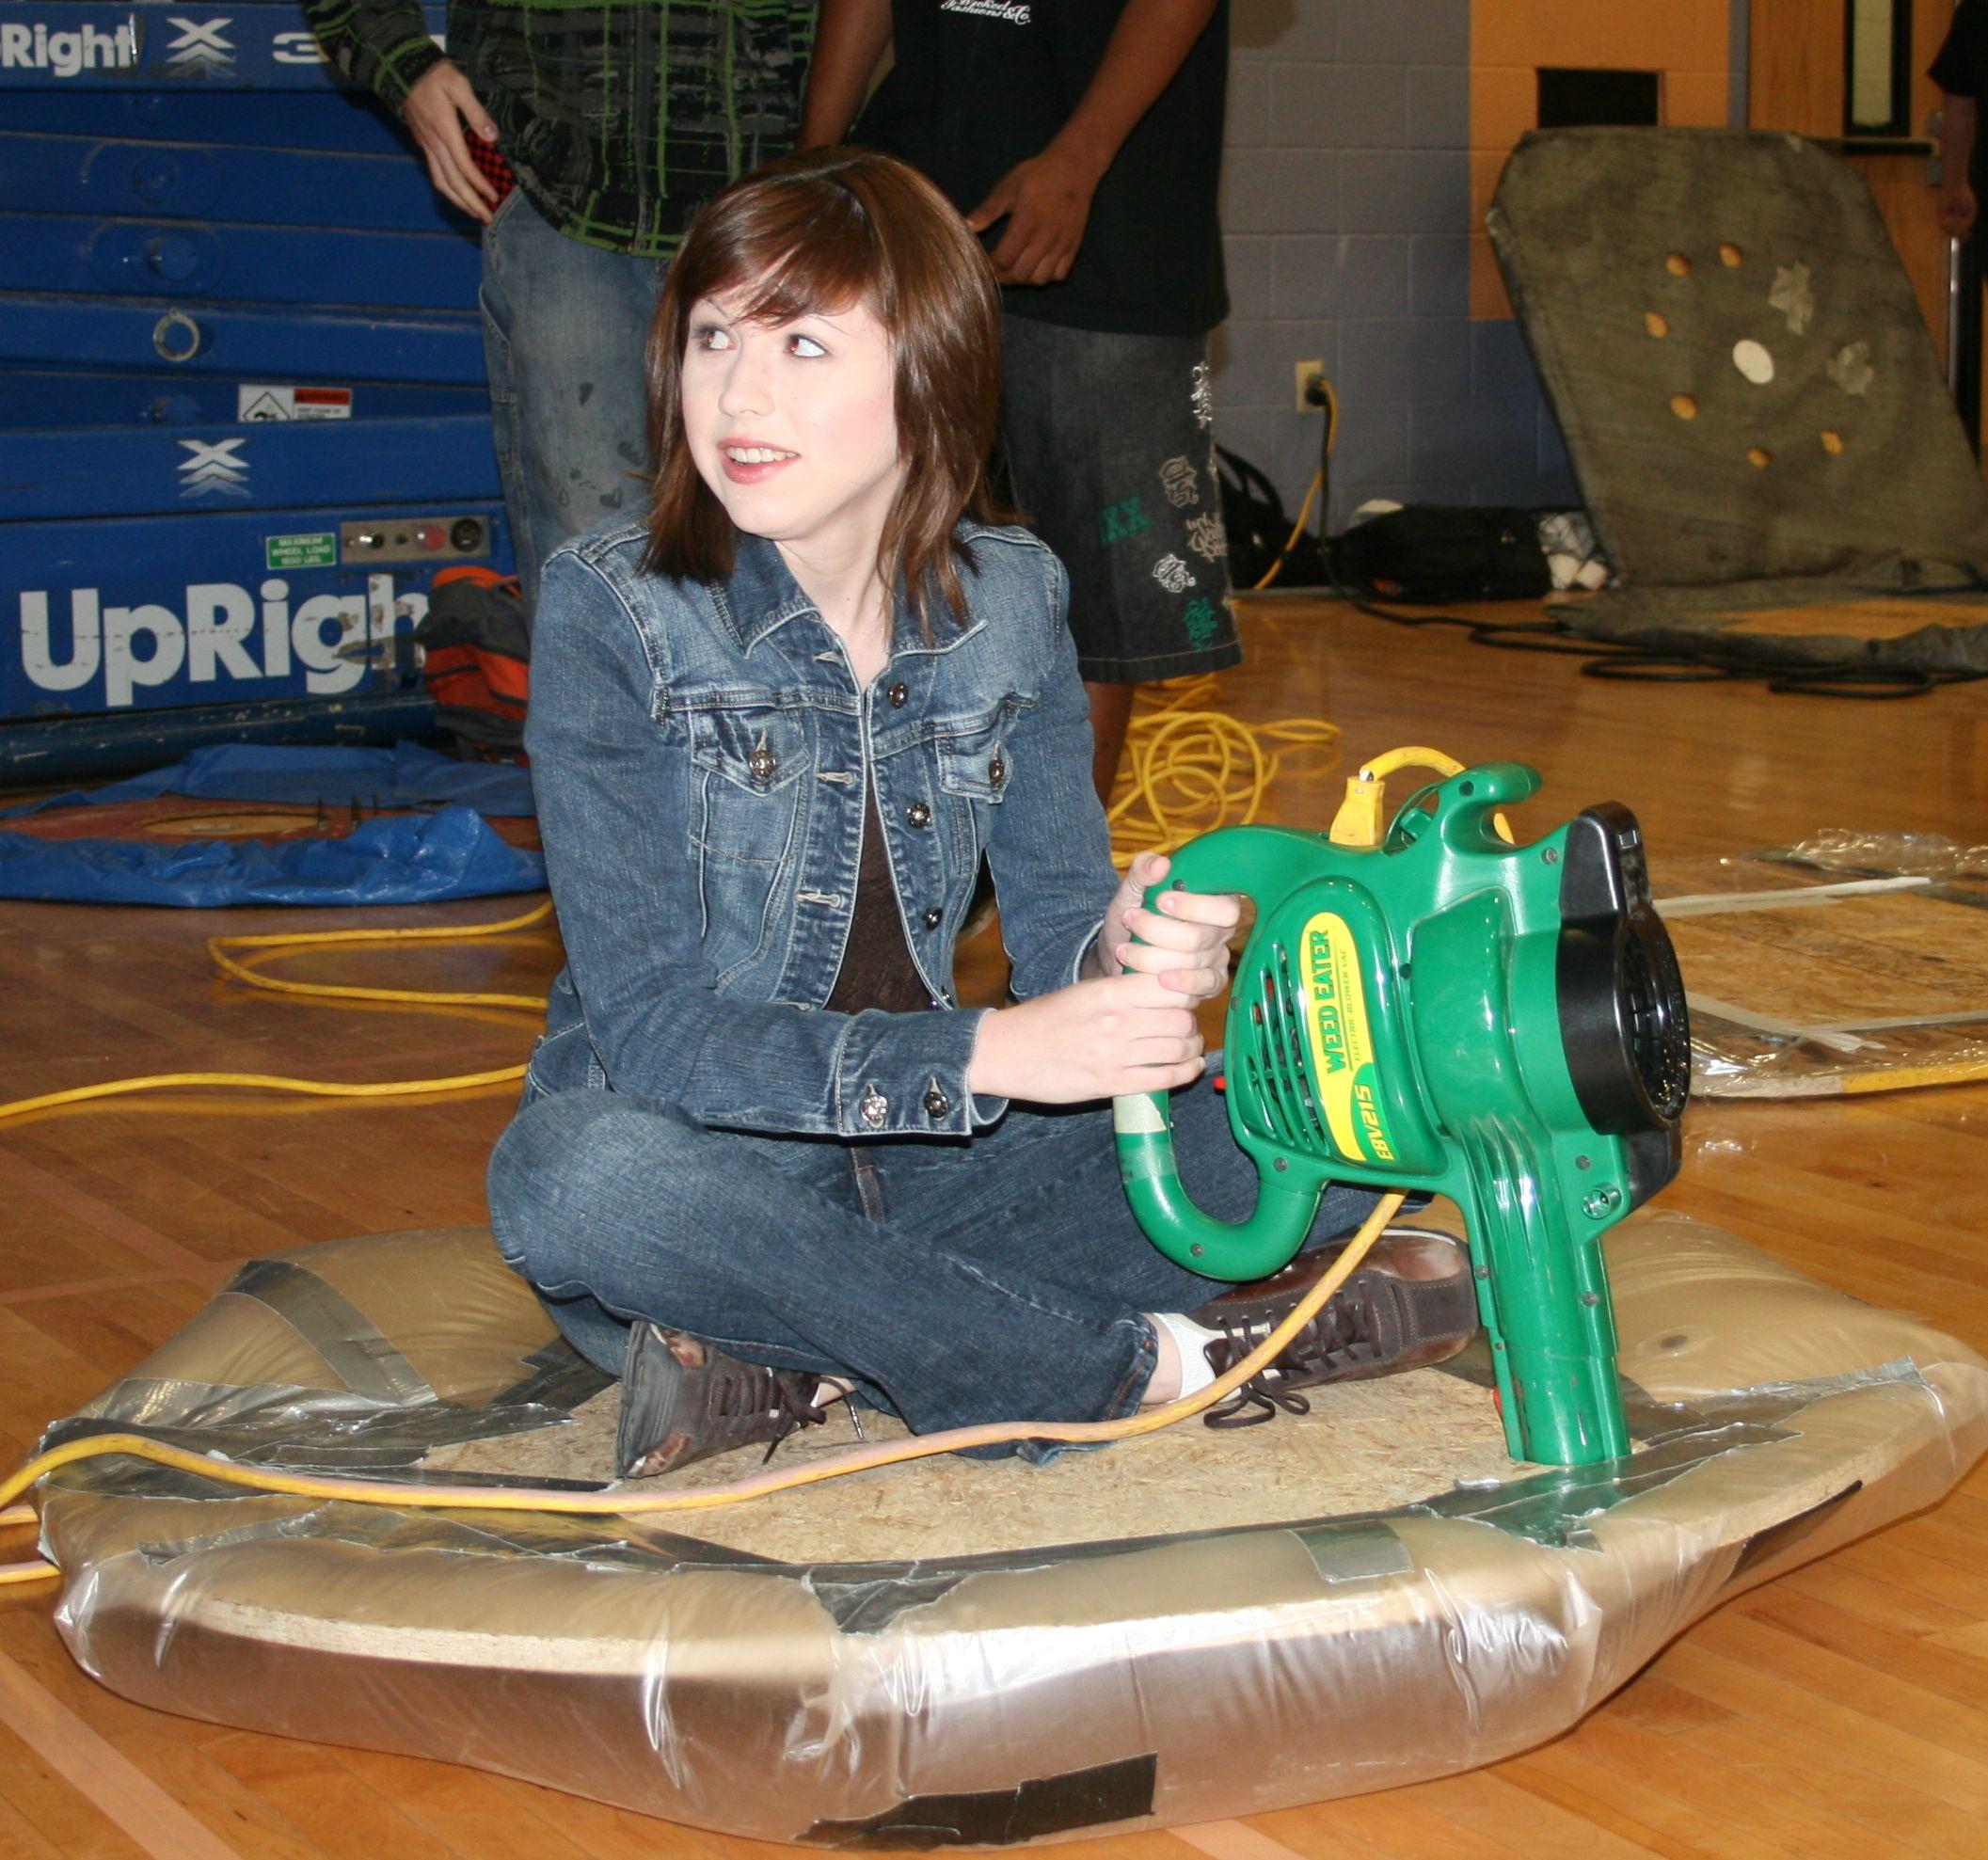 How to Create a Hovercraft